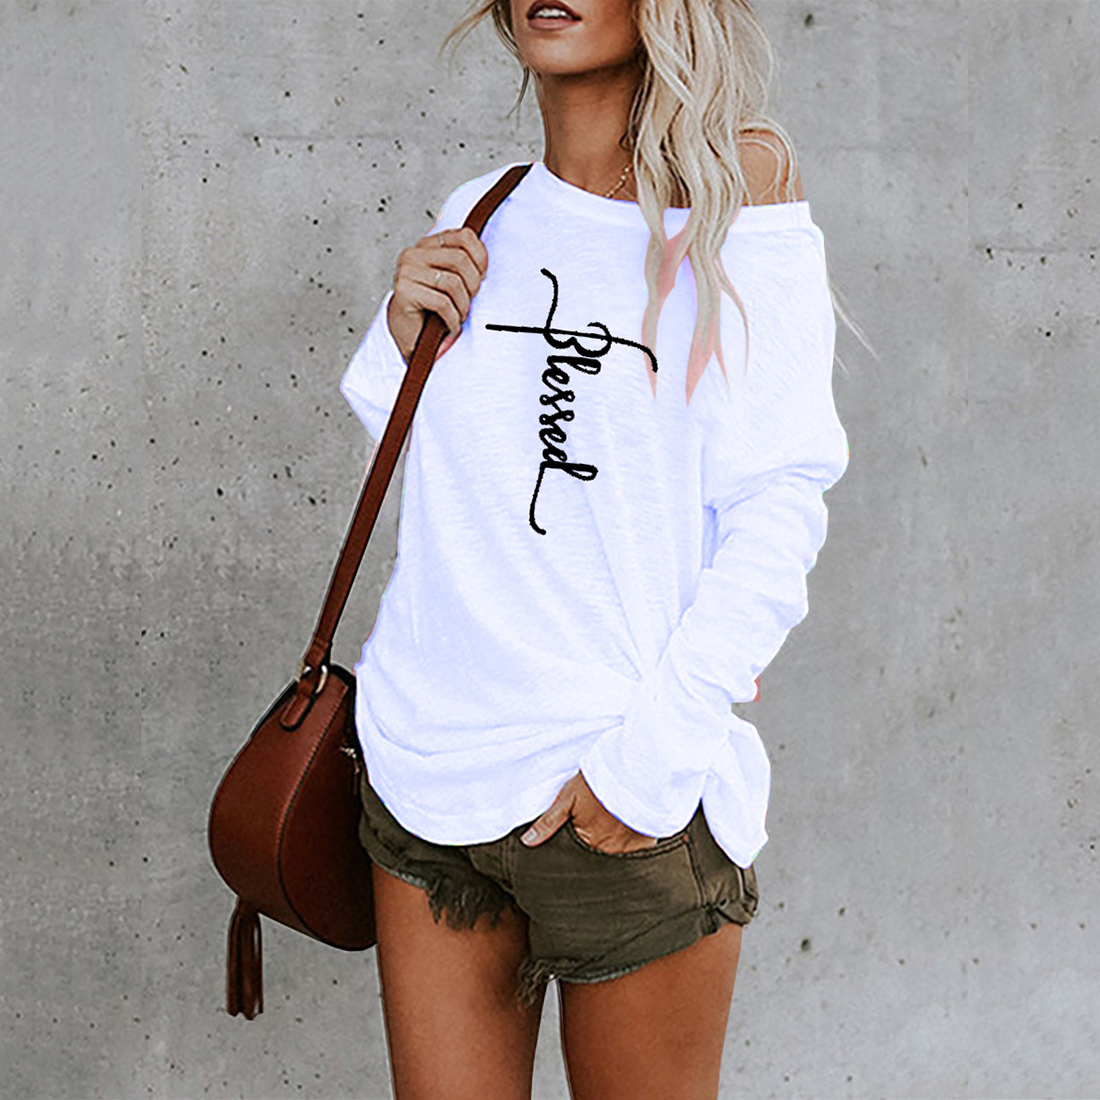 White T shirt Women Fashion Round Neck longsleeve Shirt Women Tops Mid-length Top printed Irregular T-Shirts 2021 Spring Clothes